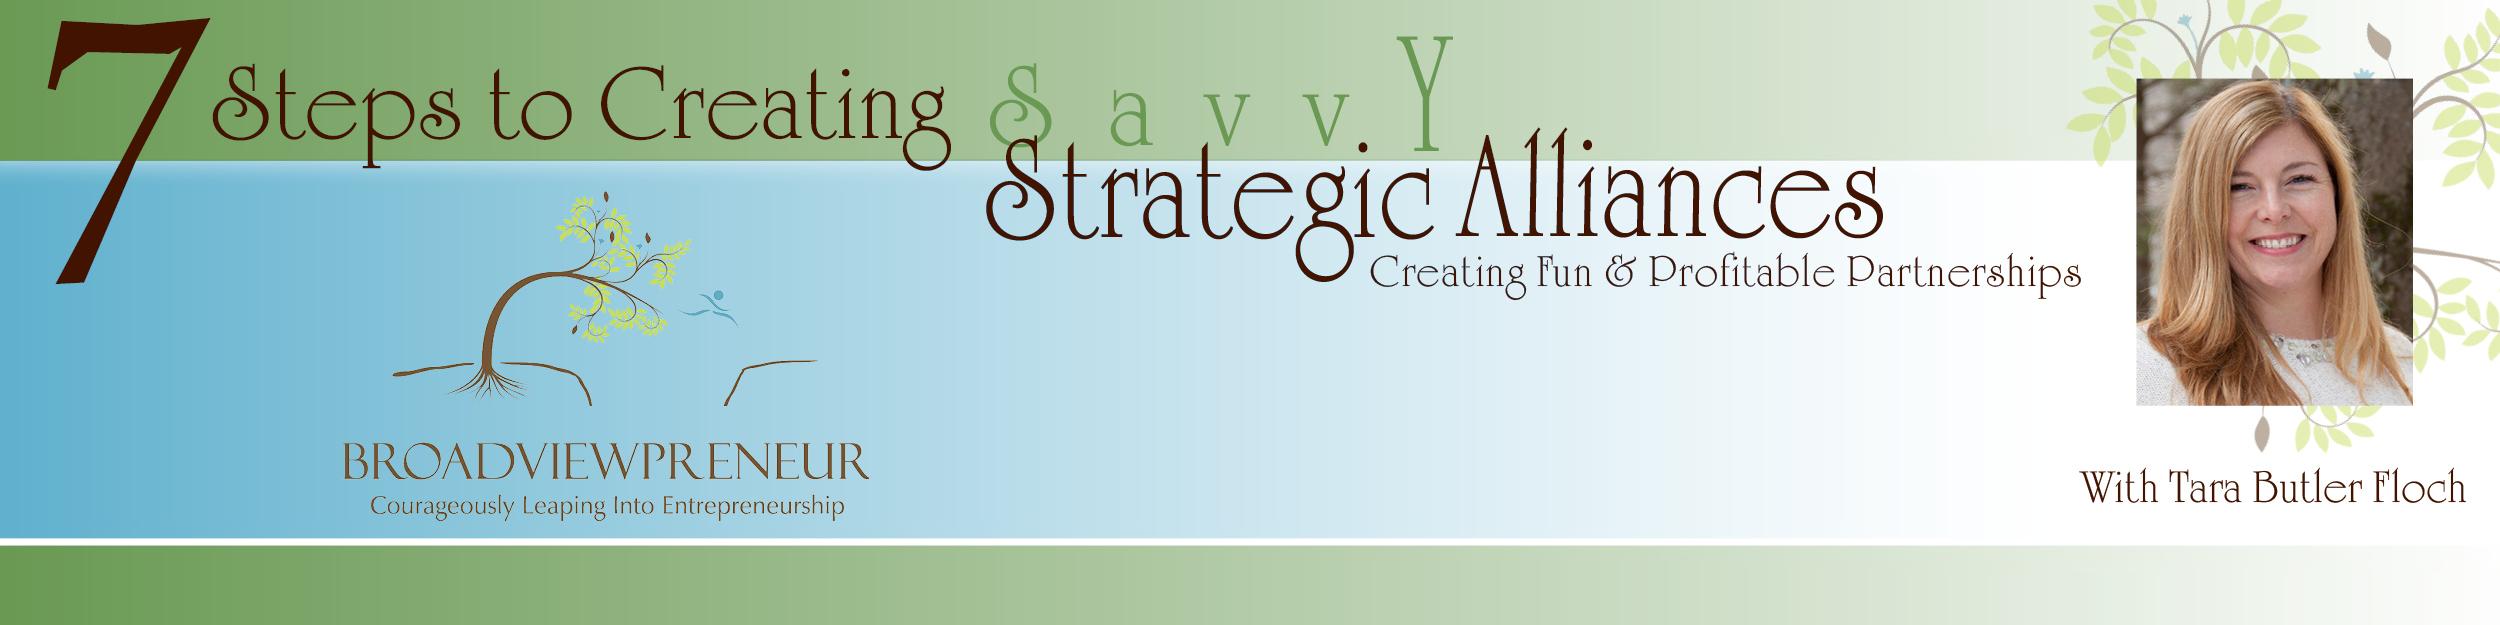 SSA 7 steps banner